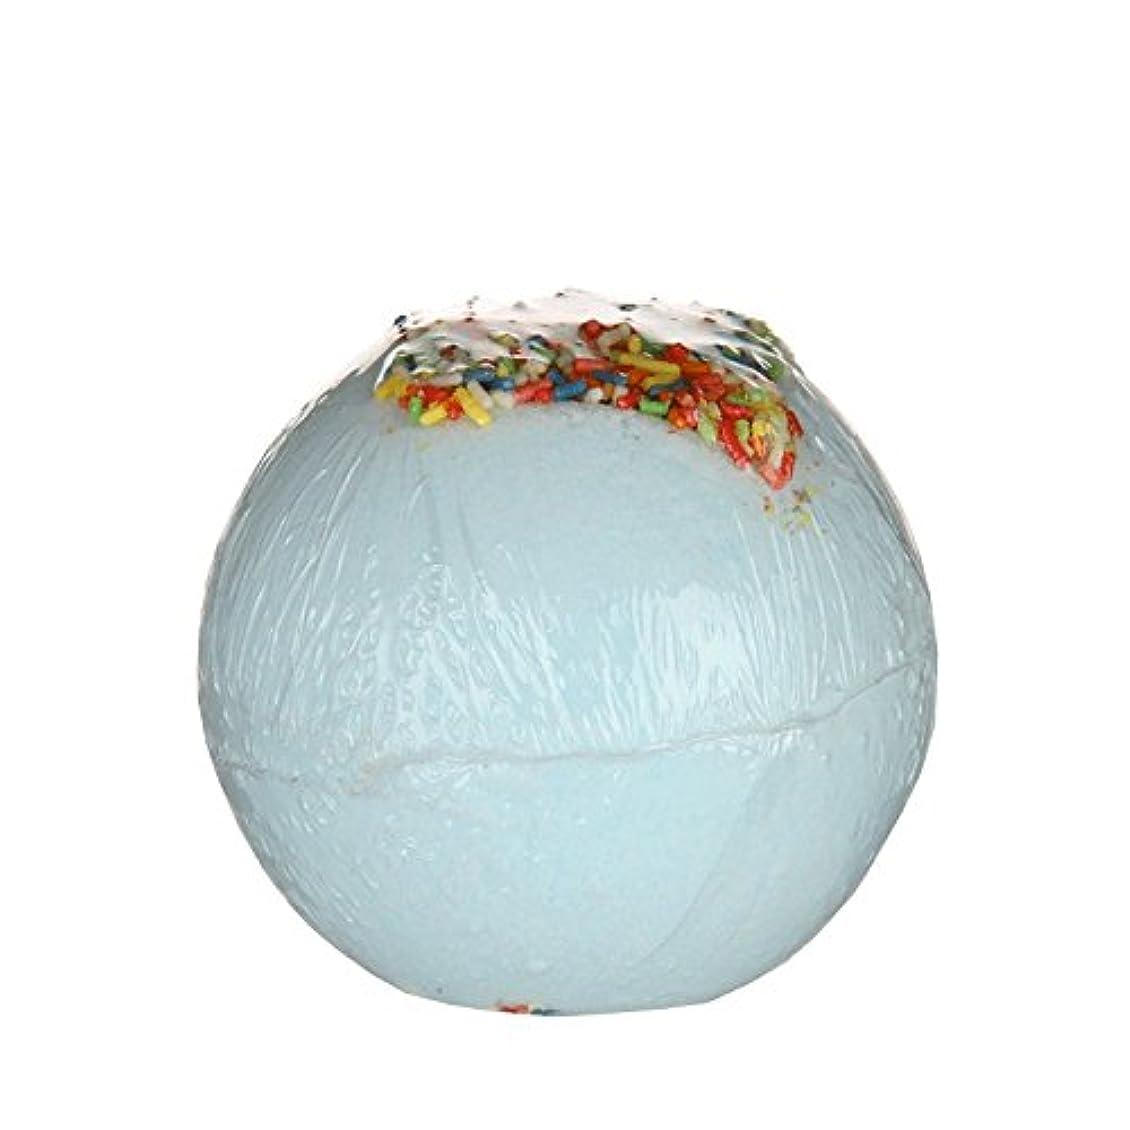 Treets Bath Ball Disco Bath 170g (Pack of 2) - Treetsバスボールディスコバス170グラム (x2) [並行輸入品]